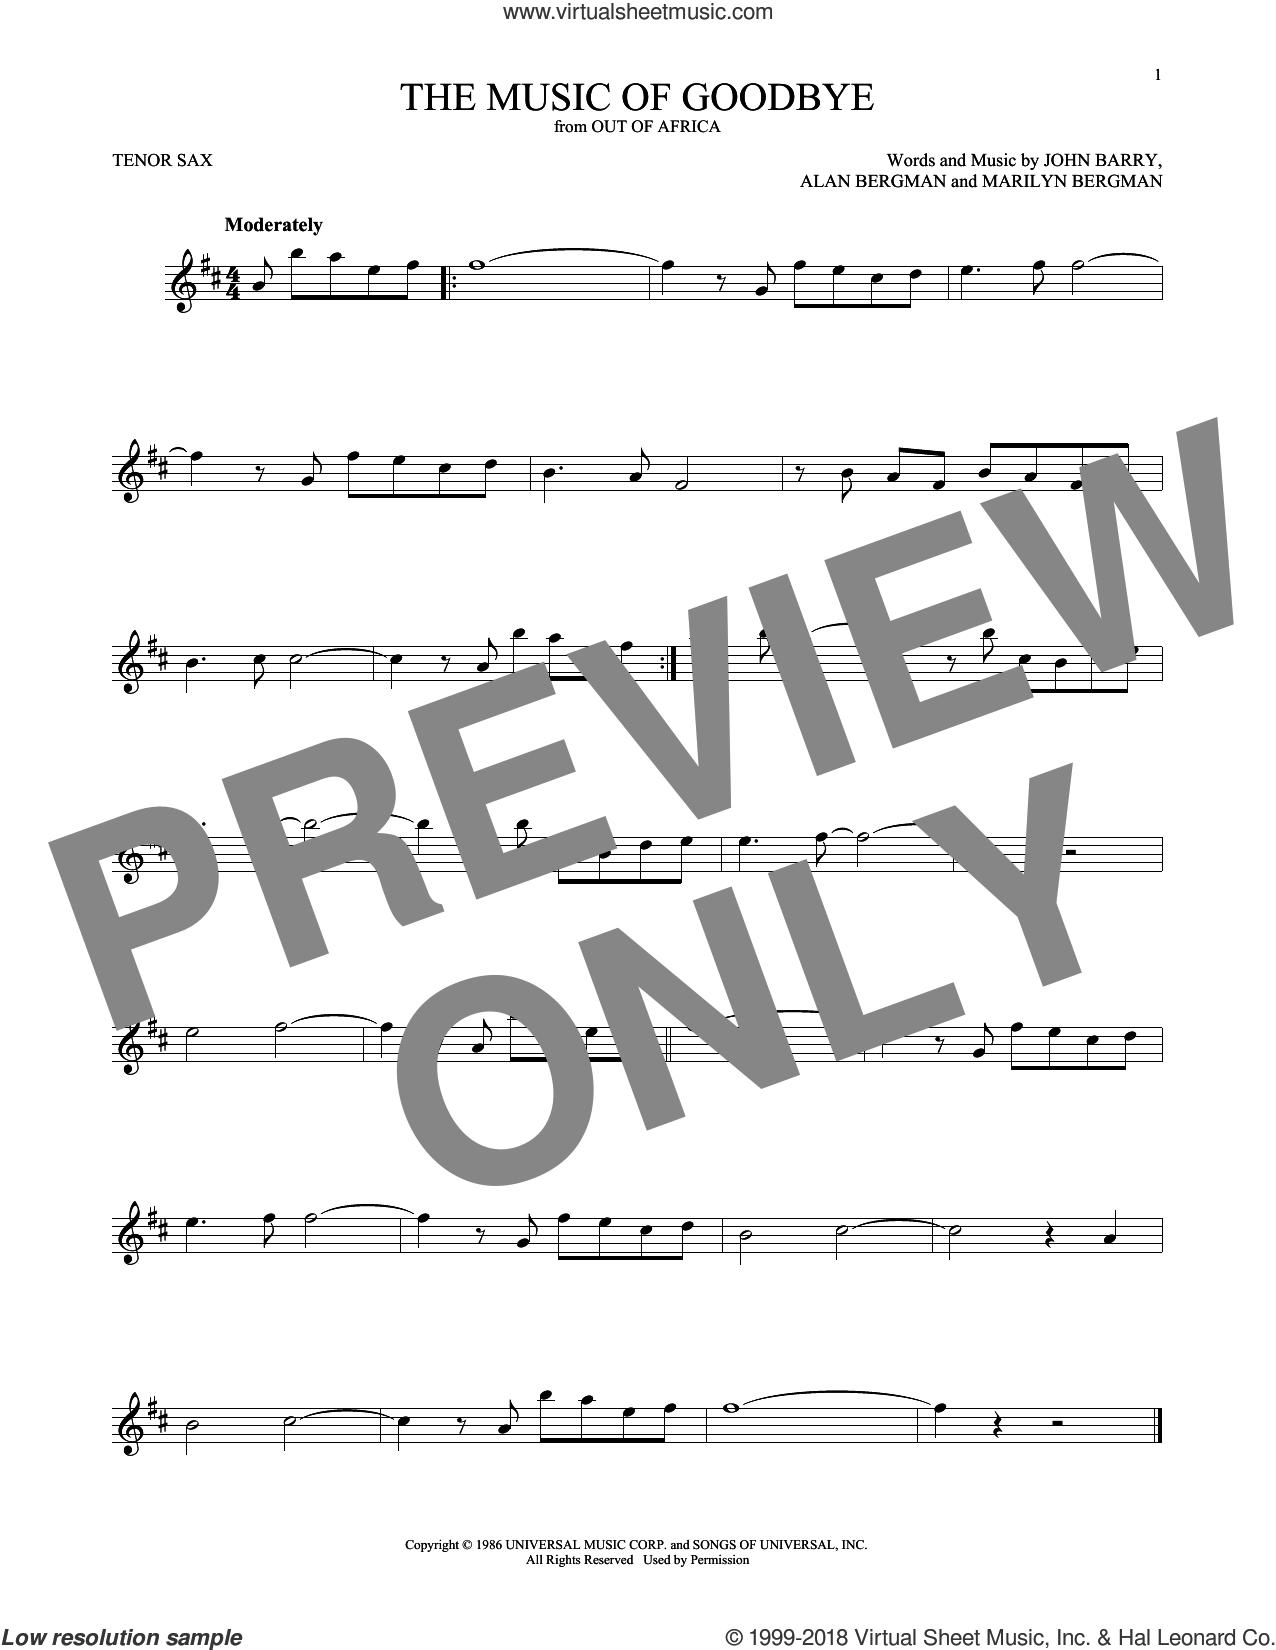 The Music Of Goodbye sheet music for tenor saxophone solo by John Barry, Alan Bergman and Marilyn Bergman, intermediate skill level